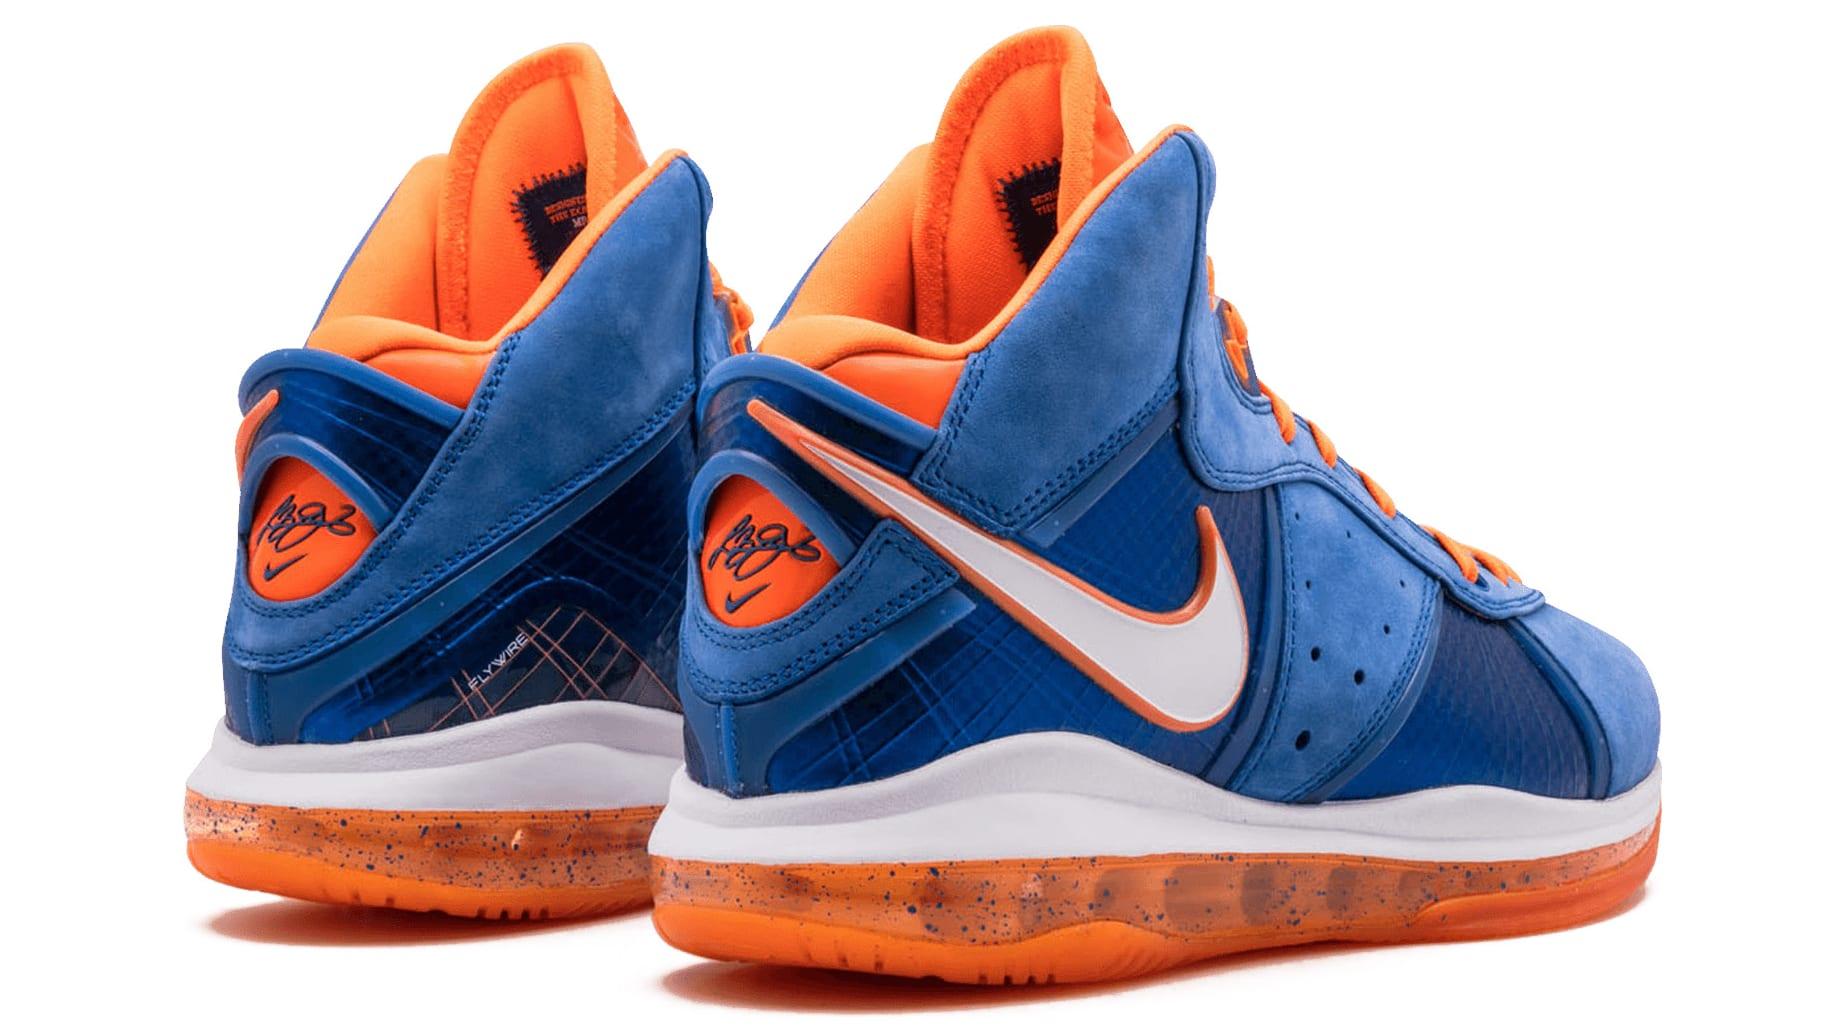 Nike LeBron 8 HWC Release Date CV1750-400 Heel